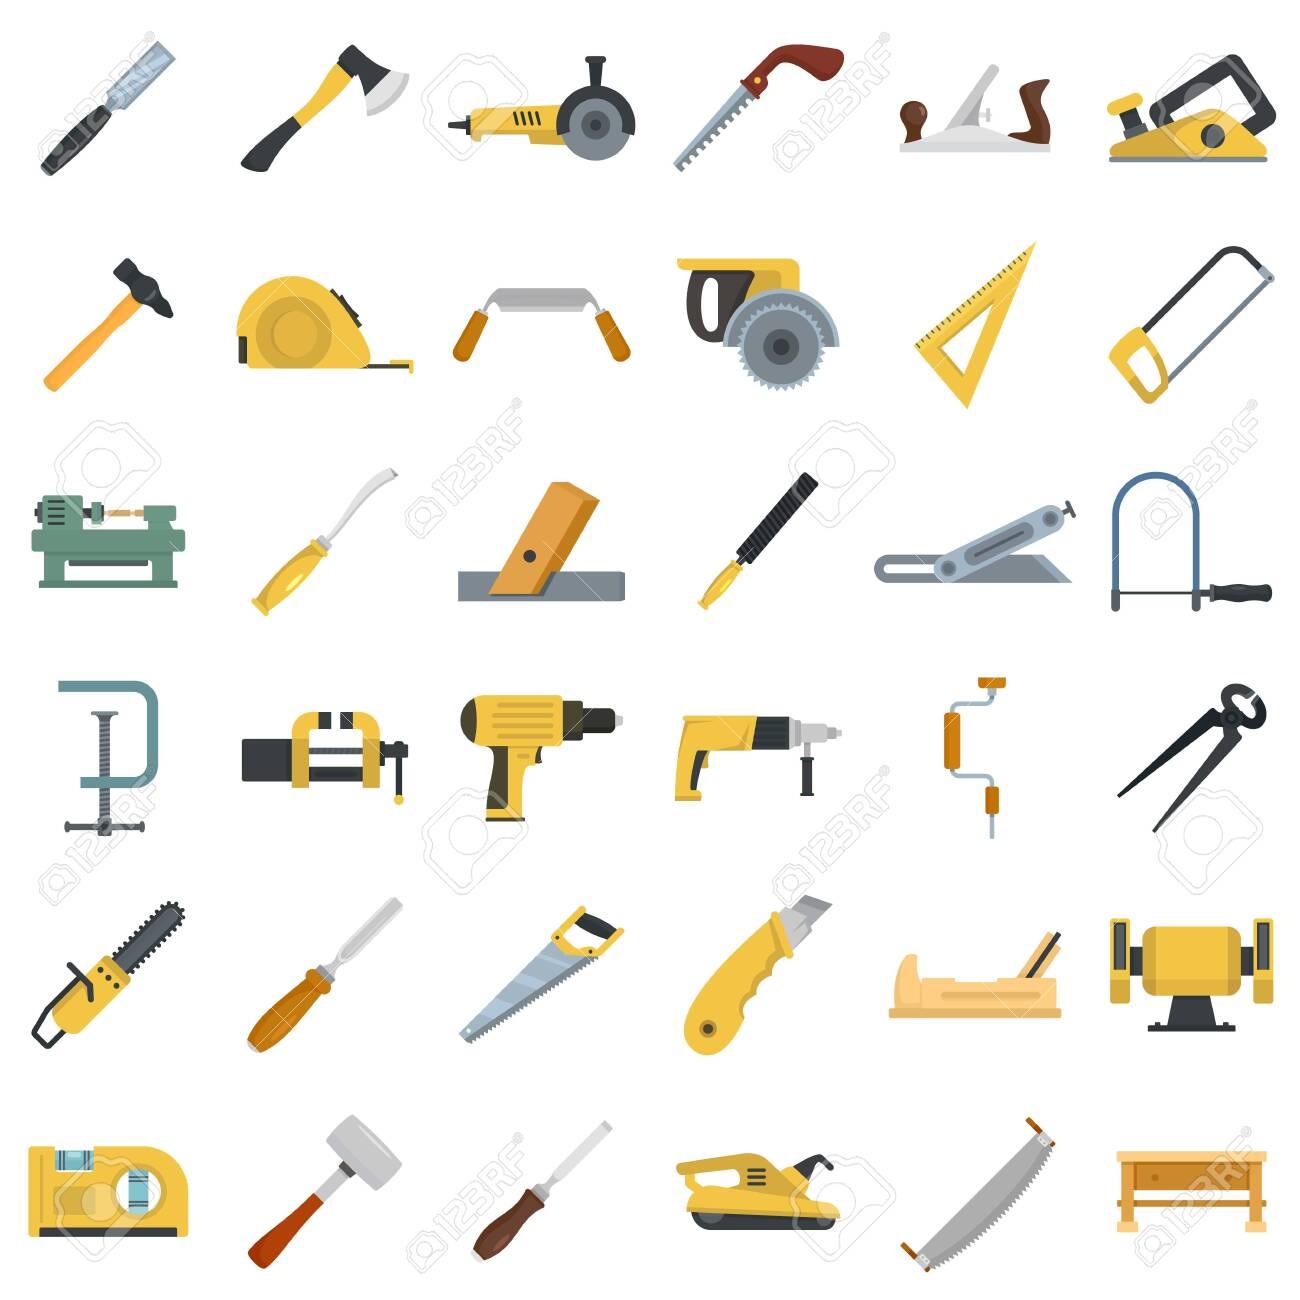 Carpenter icon set, flat style - 129577231